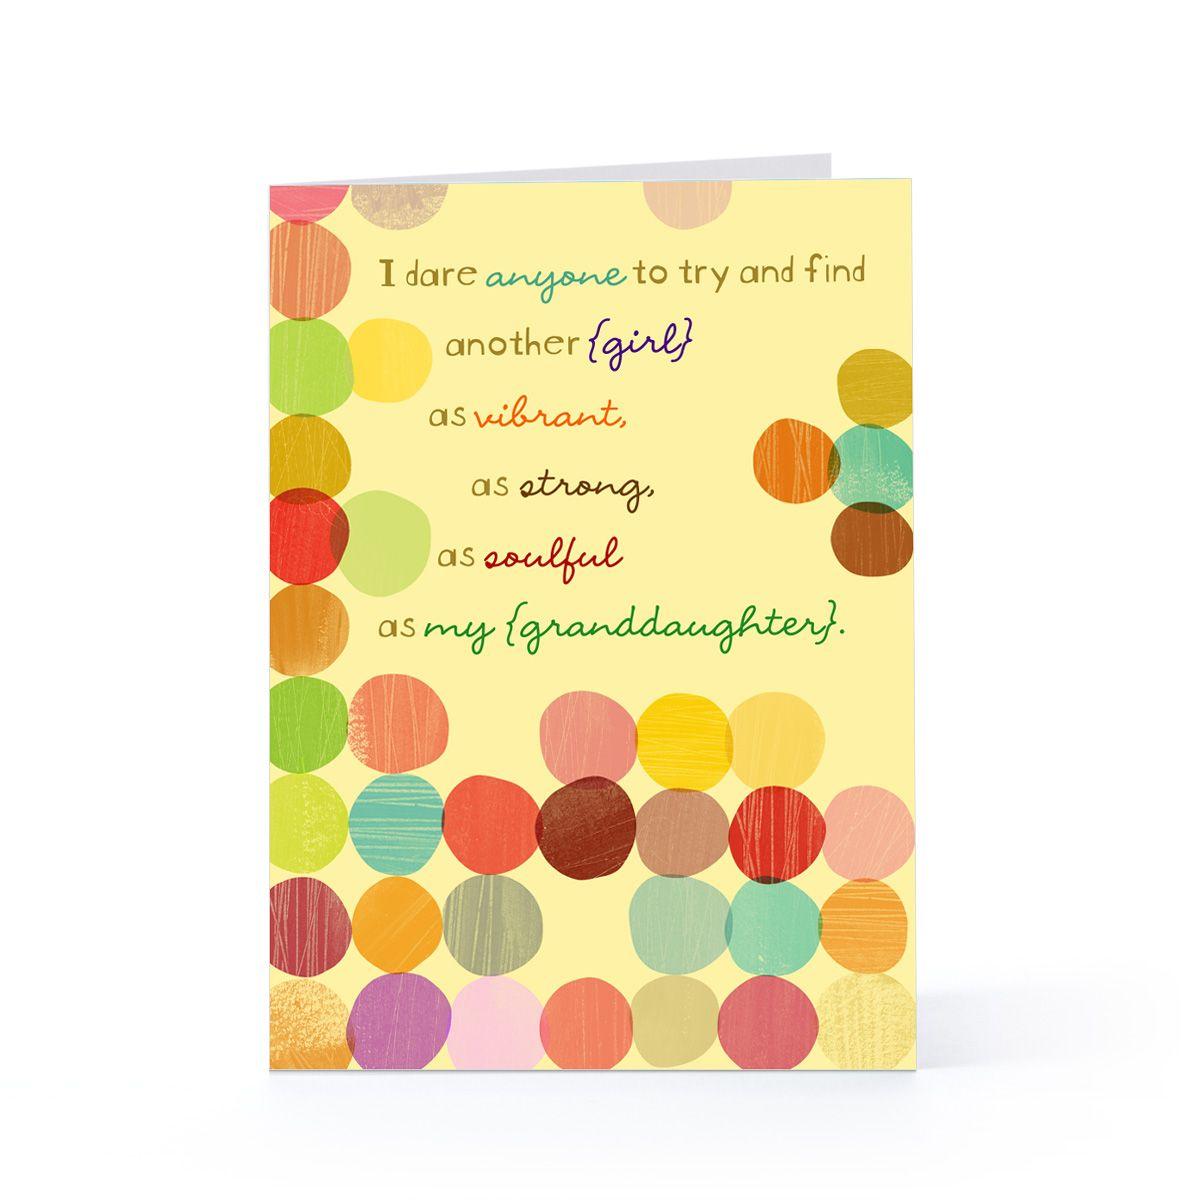 Hallmark Cards Birthday Images Store Stuff To Buy